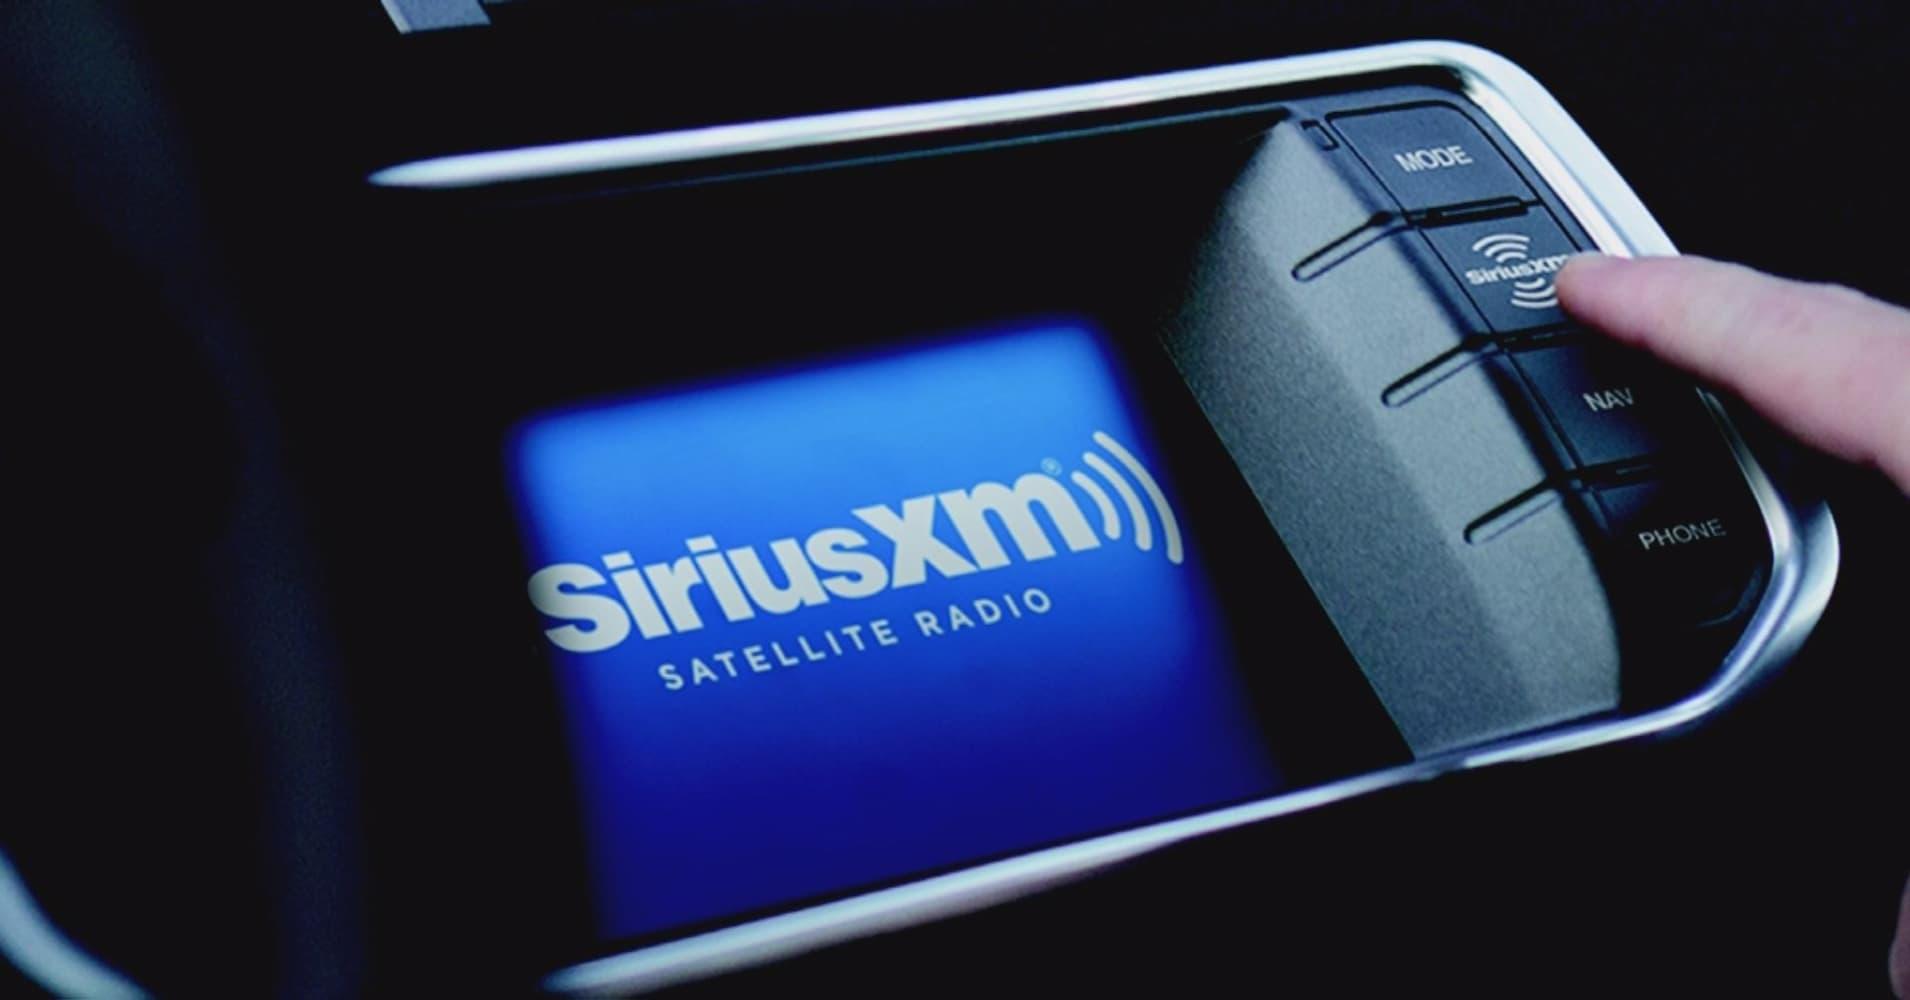 Siriusxm Christmas Stations 2019.Satellite Radio Company Siriusxm To Buy Pandora For 3 5 Billion